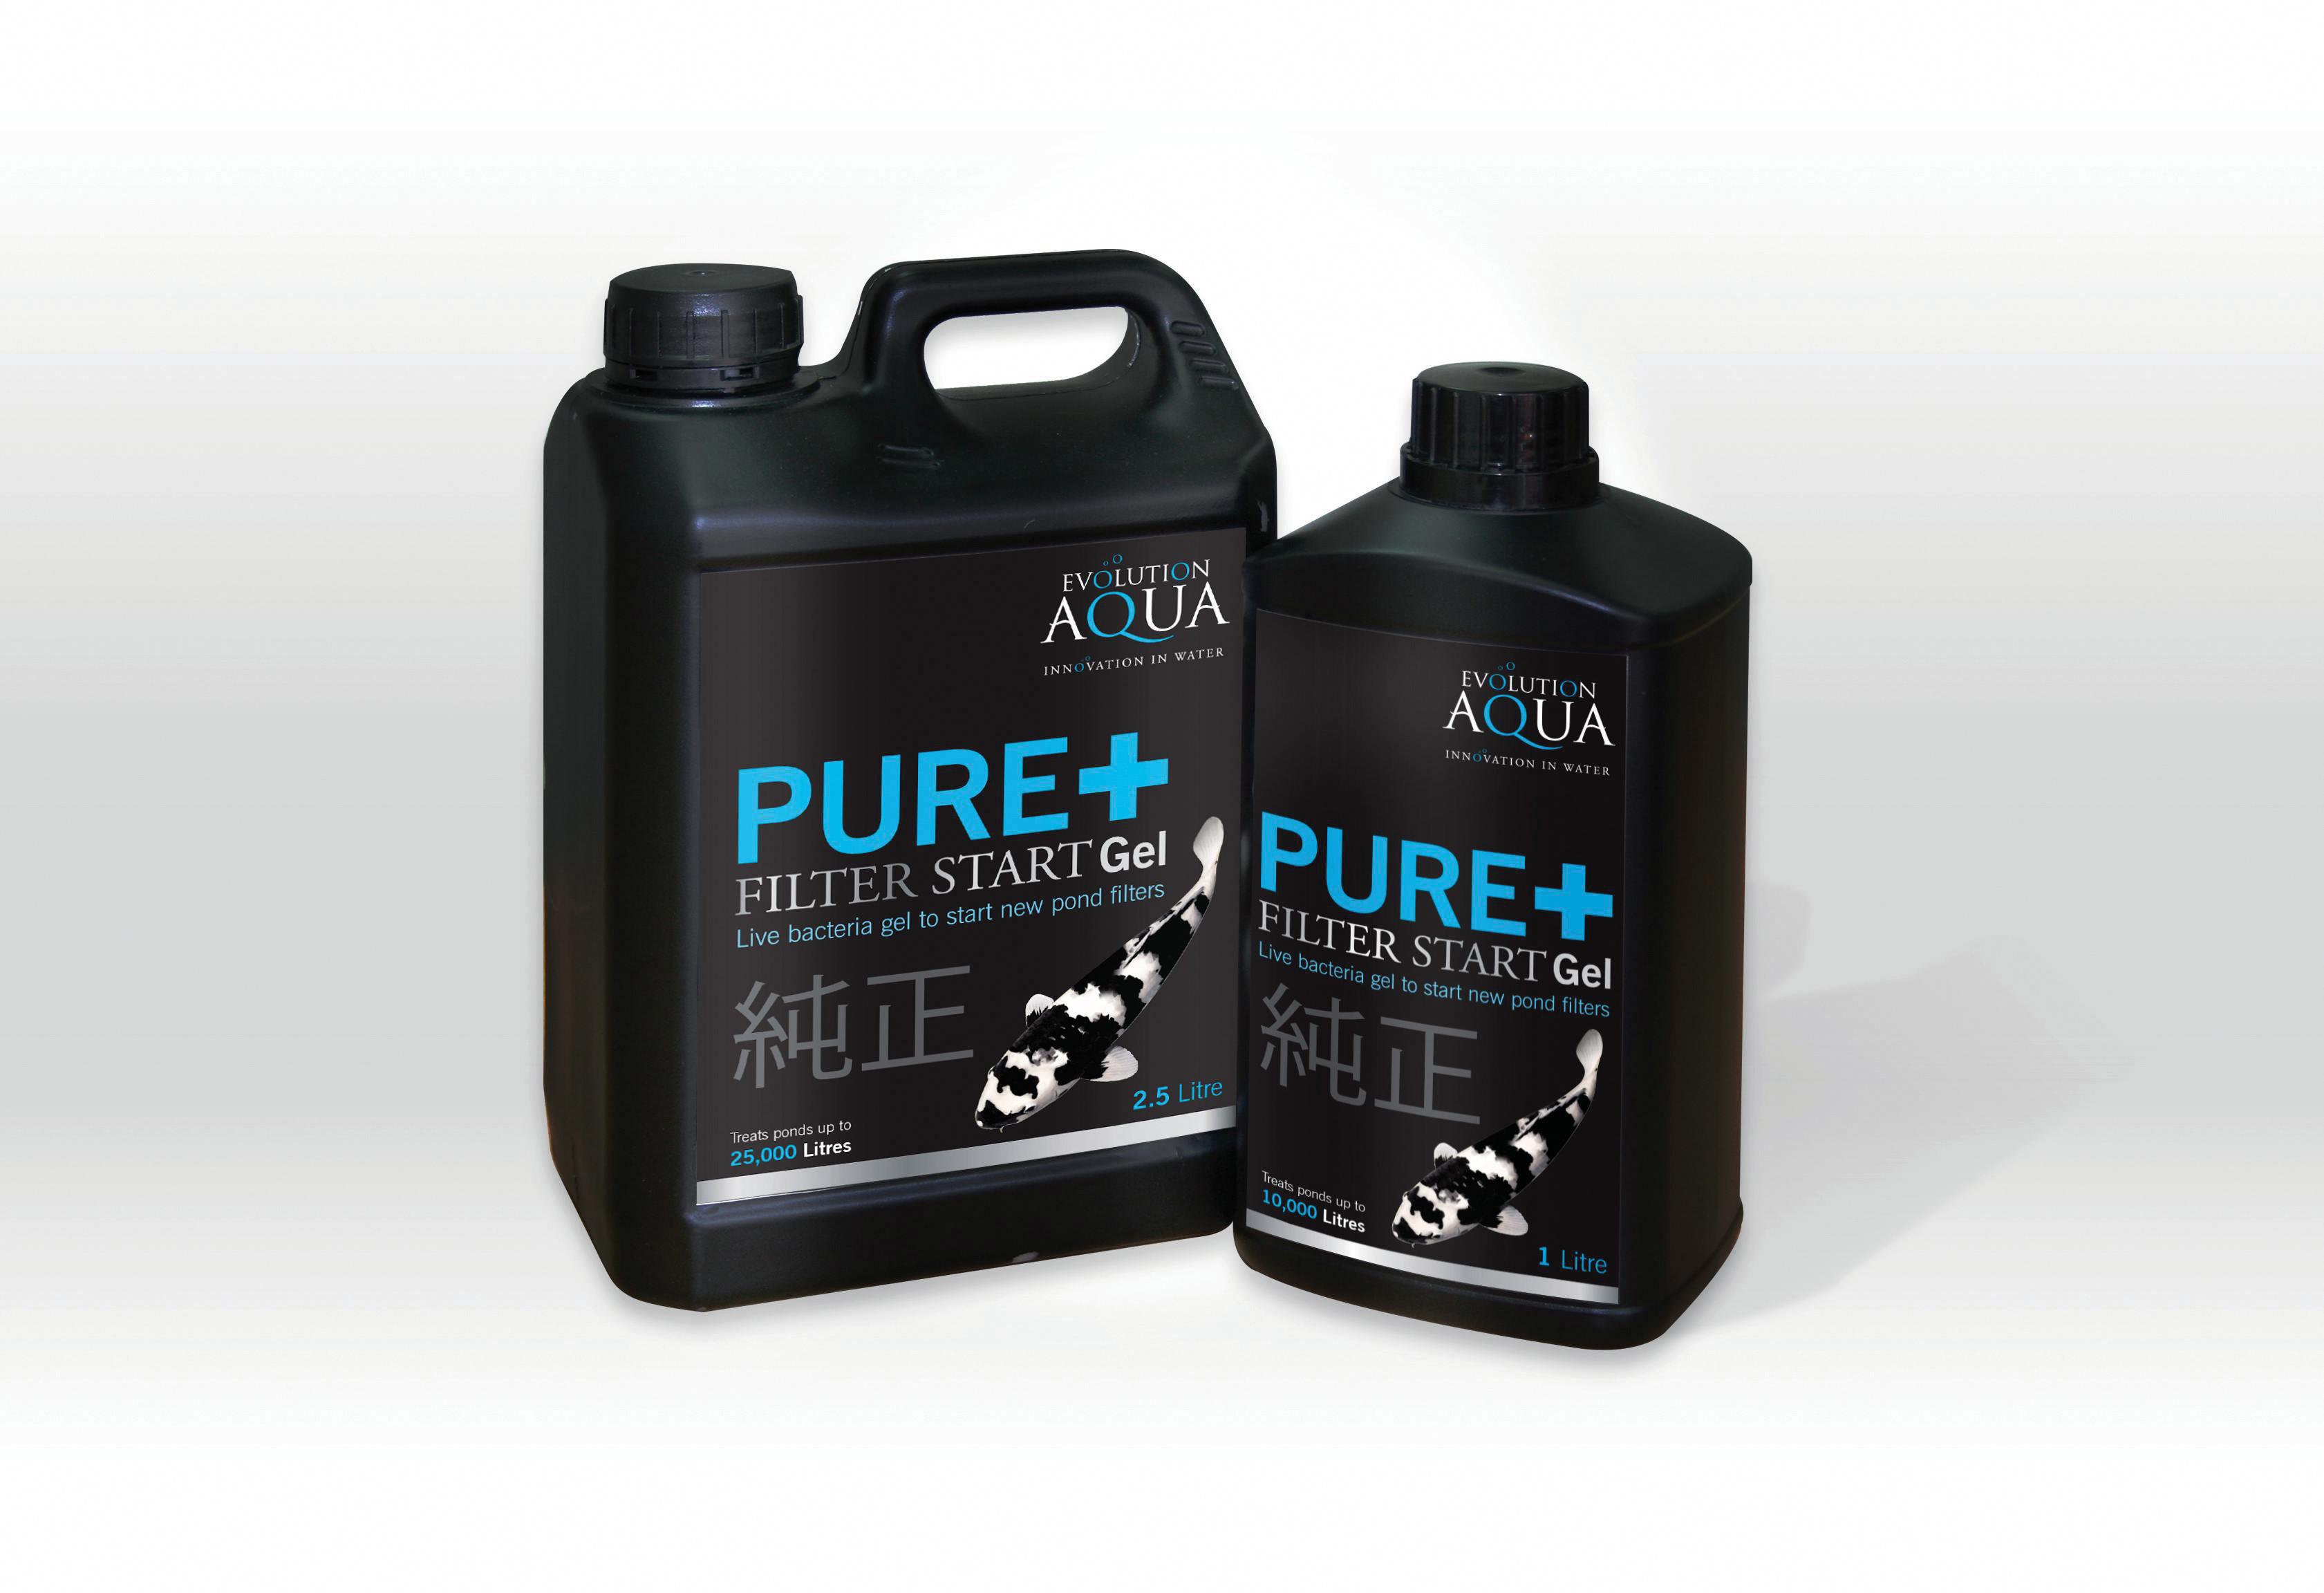 Pure+ Filterstart Gel - 1Liter